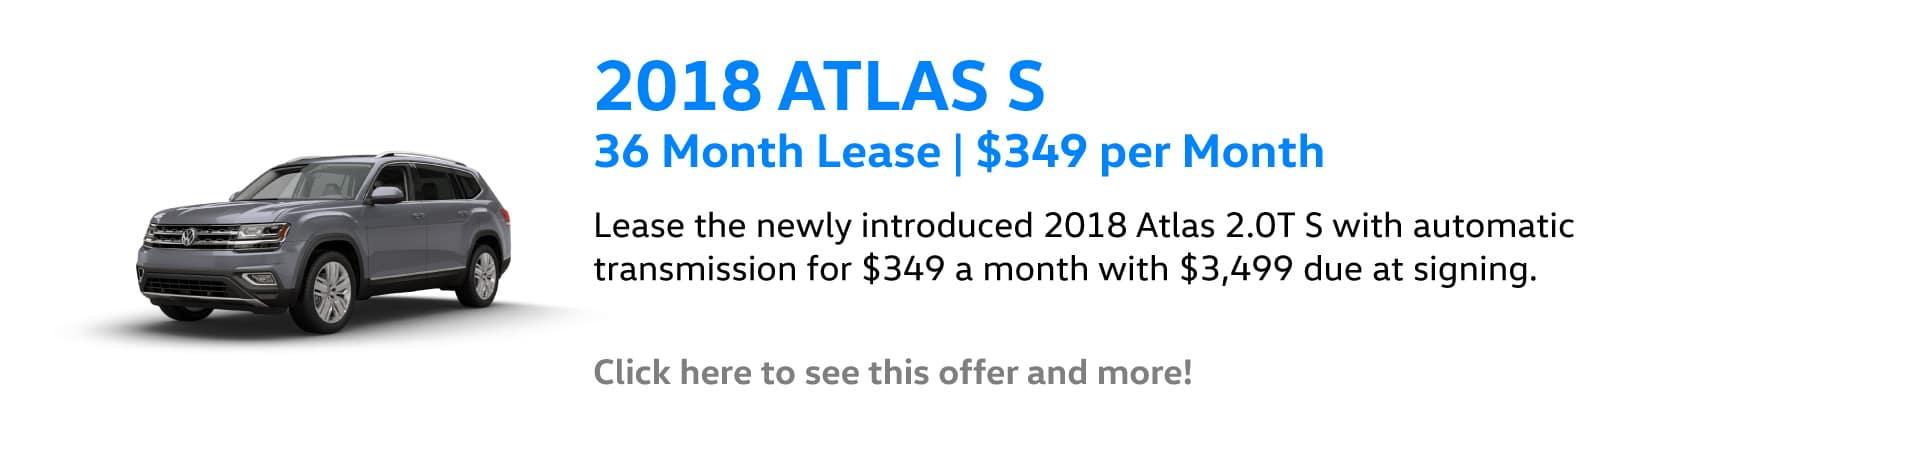 Autobahn Volkswagen | Atlas Lease Special